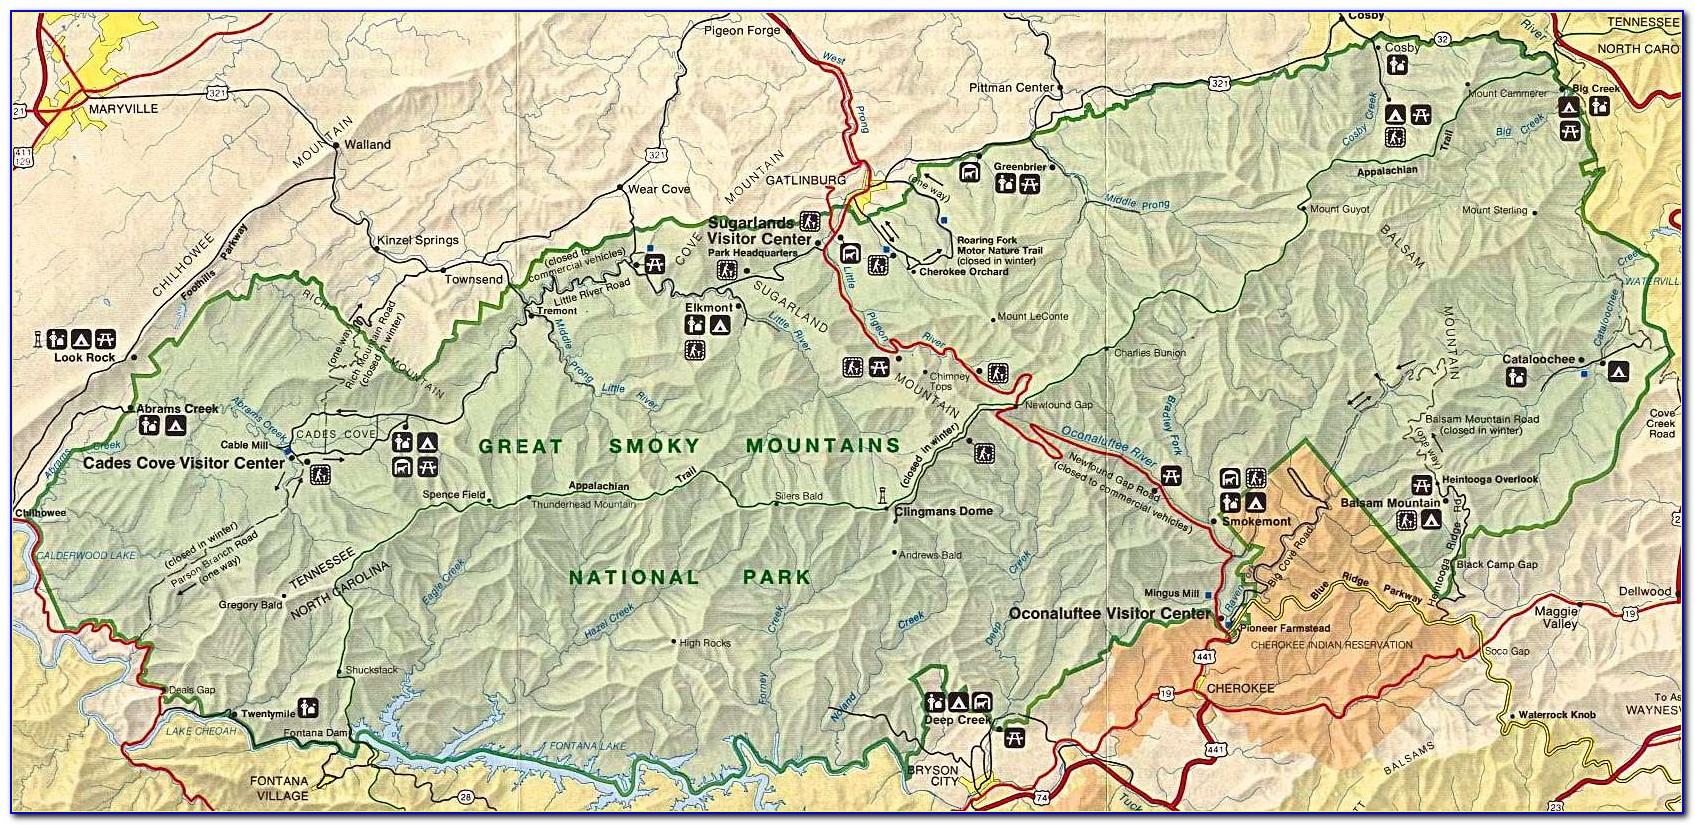 Great Smoky Mountains National Park Appalachian Trail Map